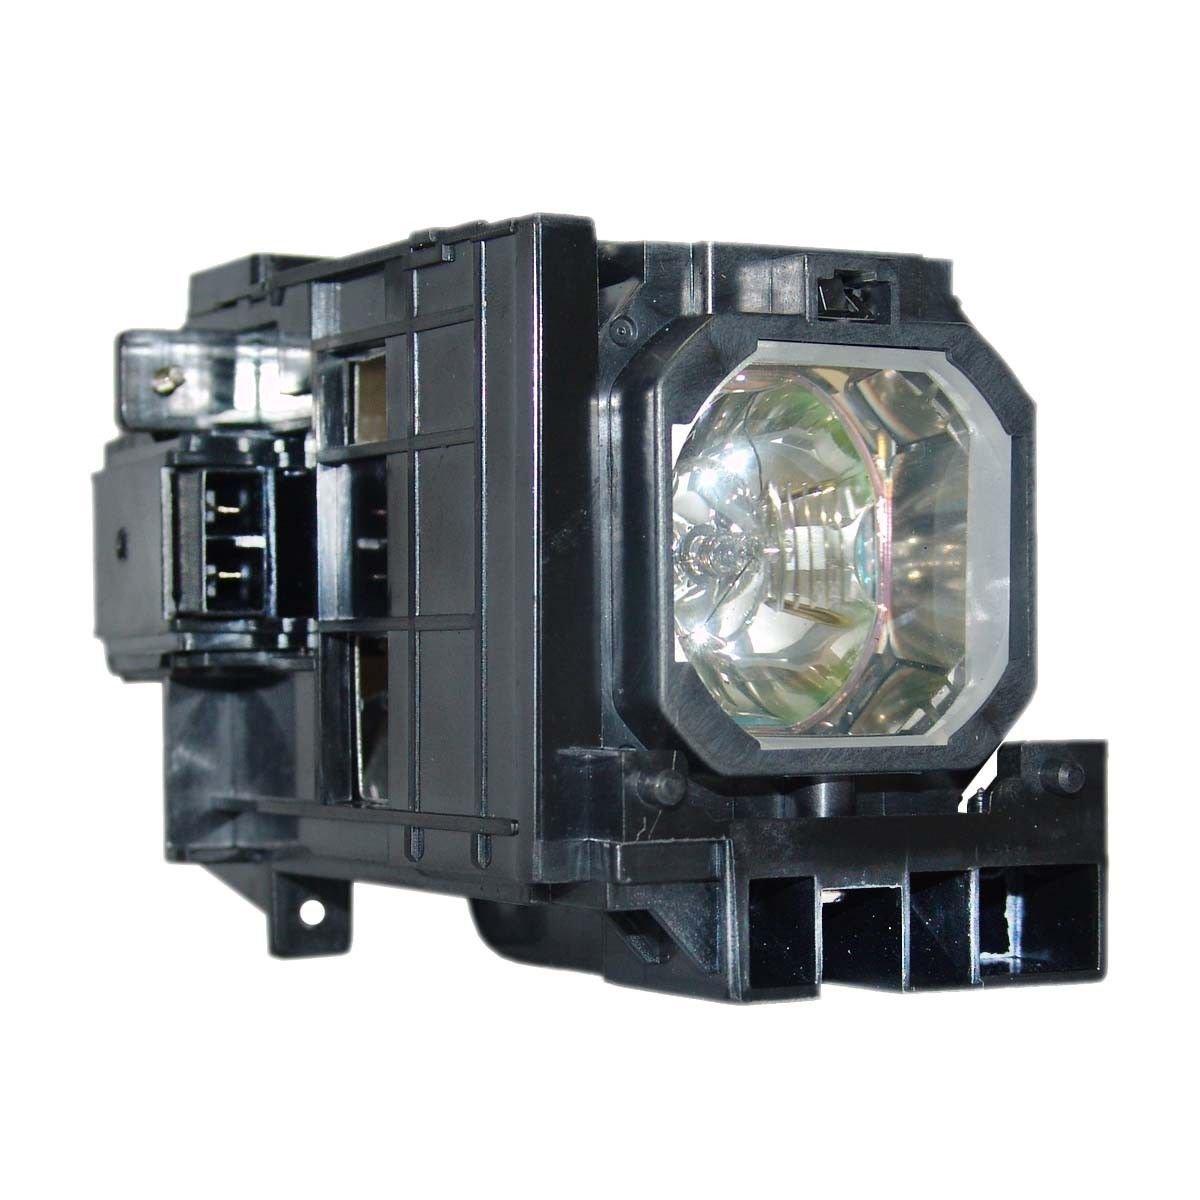 Supermait NP06LP プロジェクター交換用ランプ 汎用 150日間安心保証つき NP1150 NP2150 NP3150 NP3151 NP3151W NP1250 NP2250 NP3250 NP3250W NP1200 NP2200 NP3200 対応 B0775B7PZV